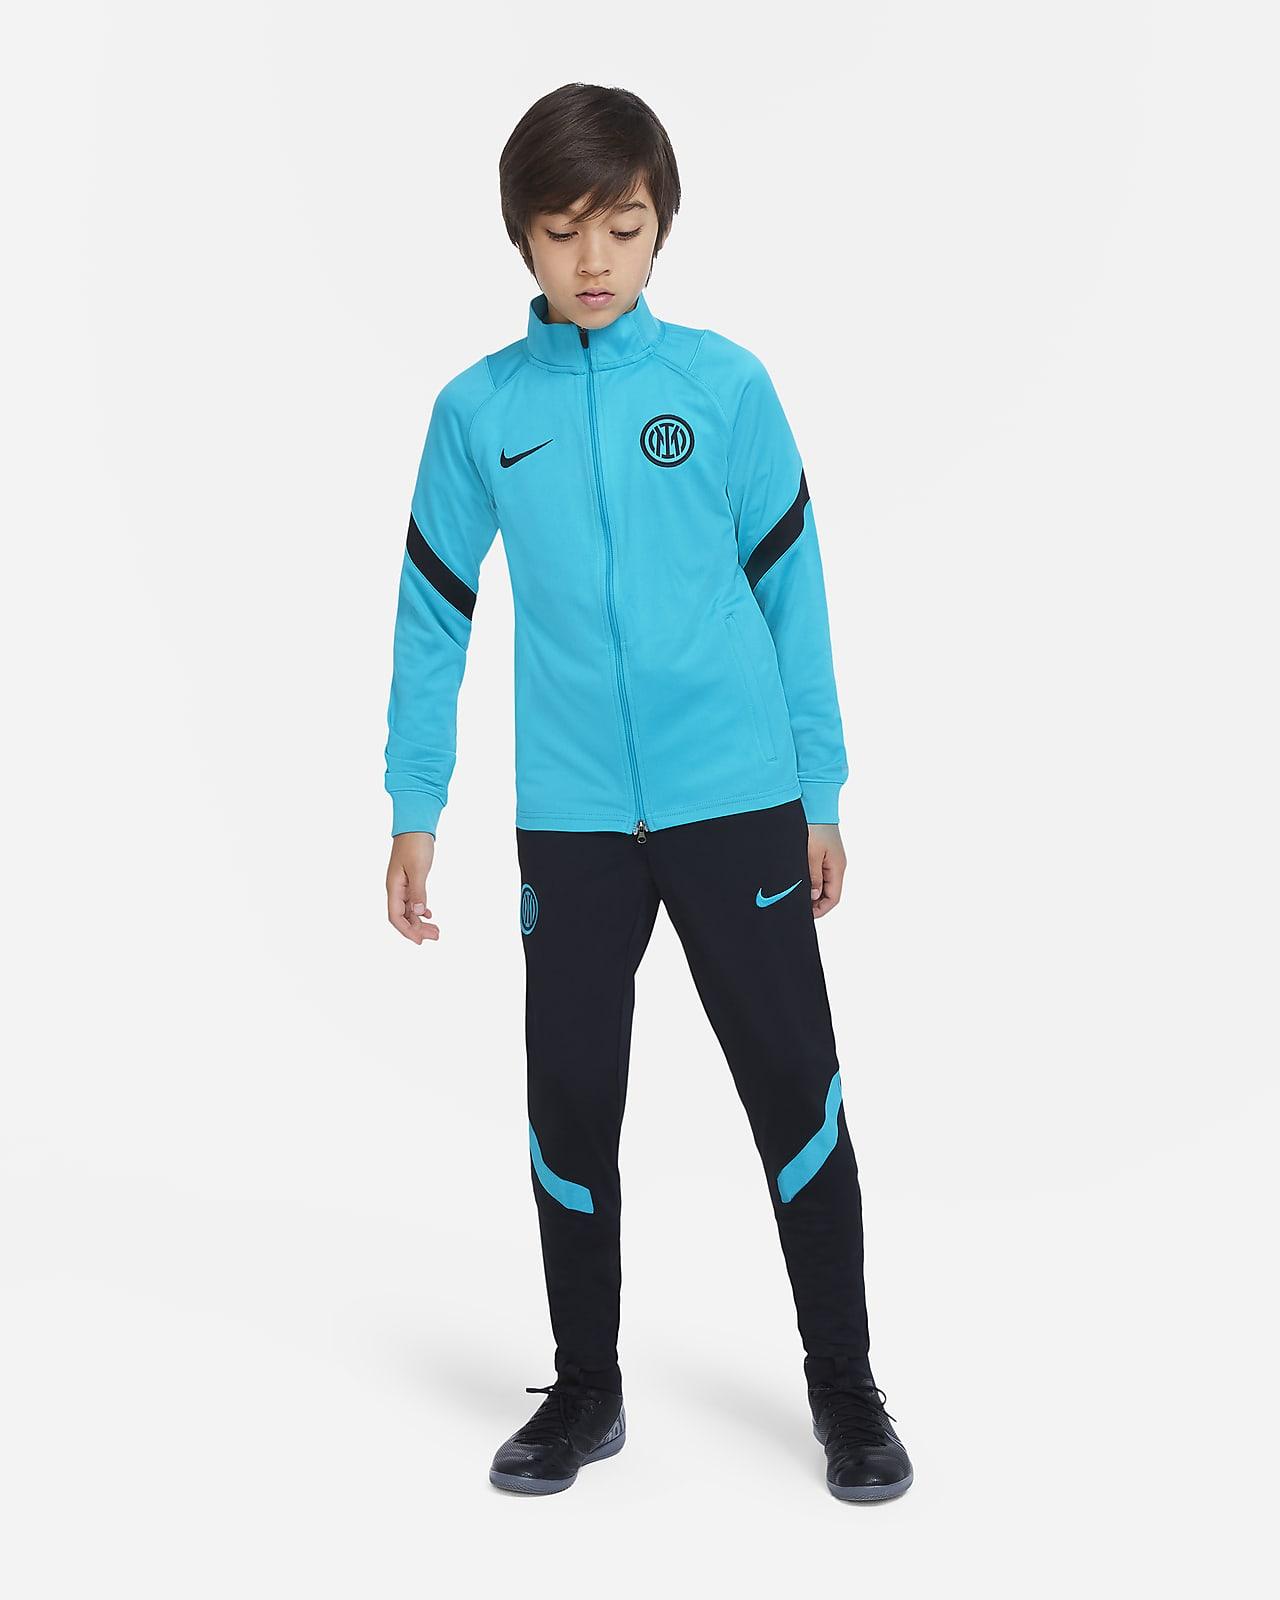 Inter Milan Strike Xandall de teixit Knit Nike Dri-FIT de futbol - Nen/a